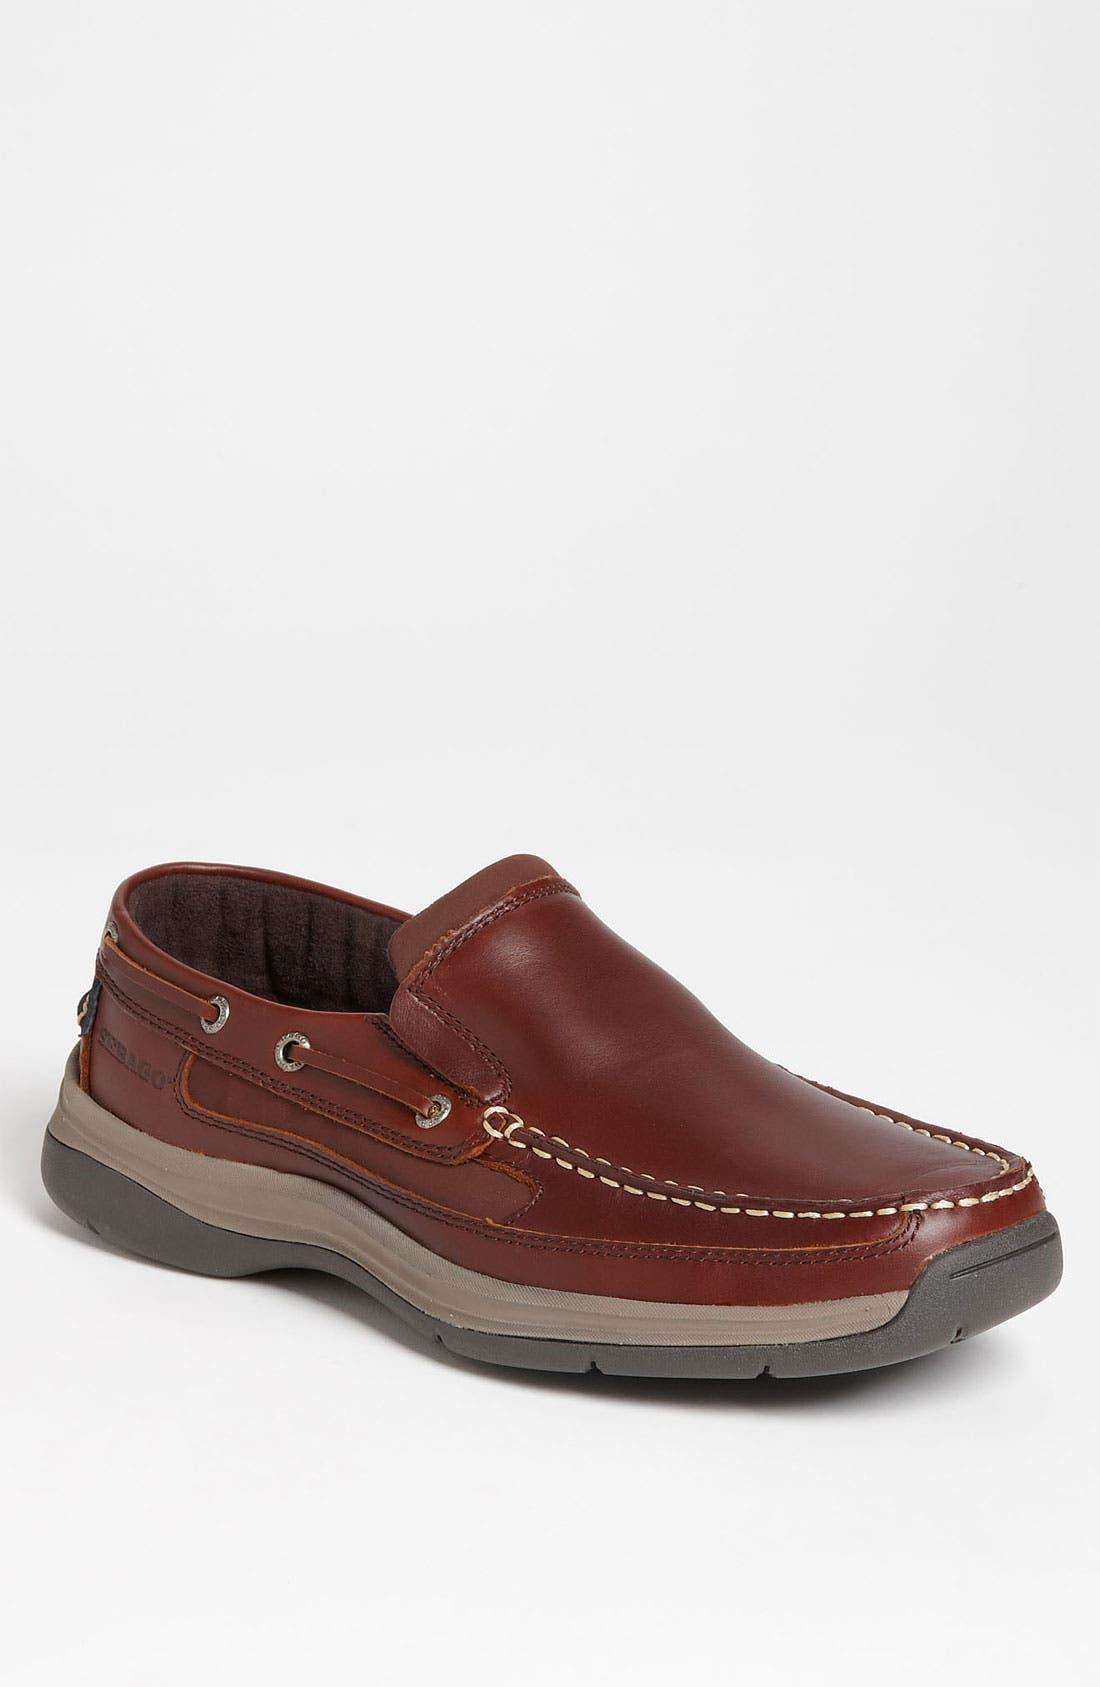 Main Image - Sebago 'Bowman' Boat Shoe (Online Only)